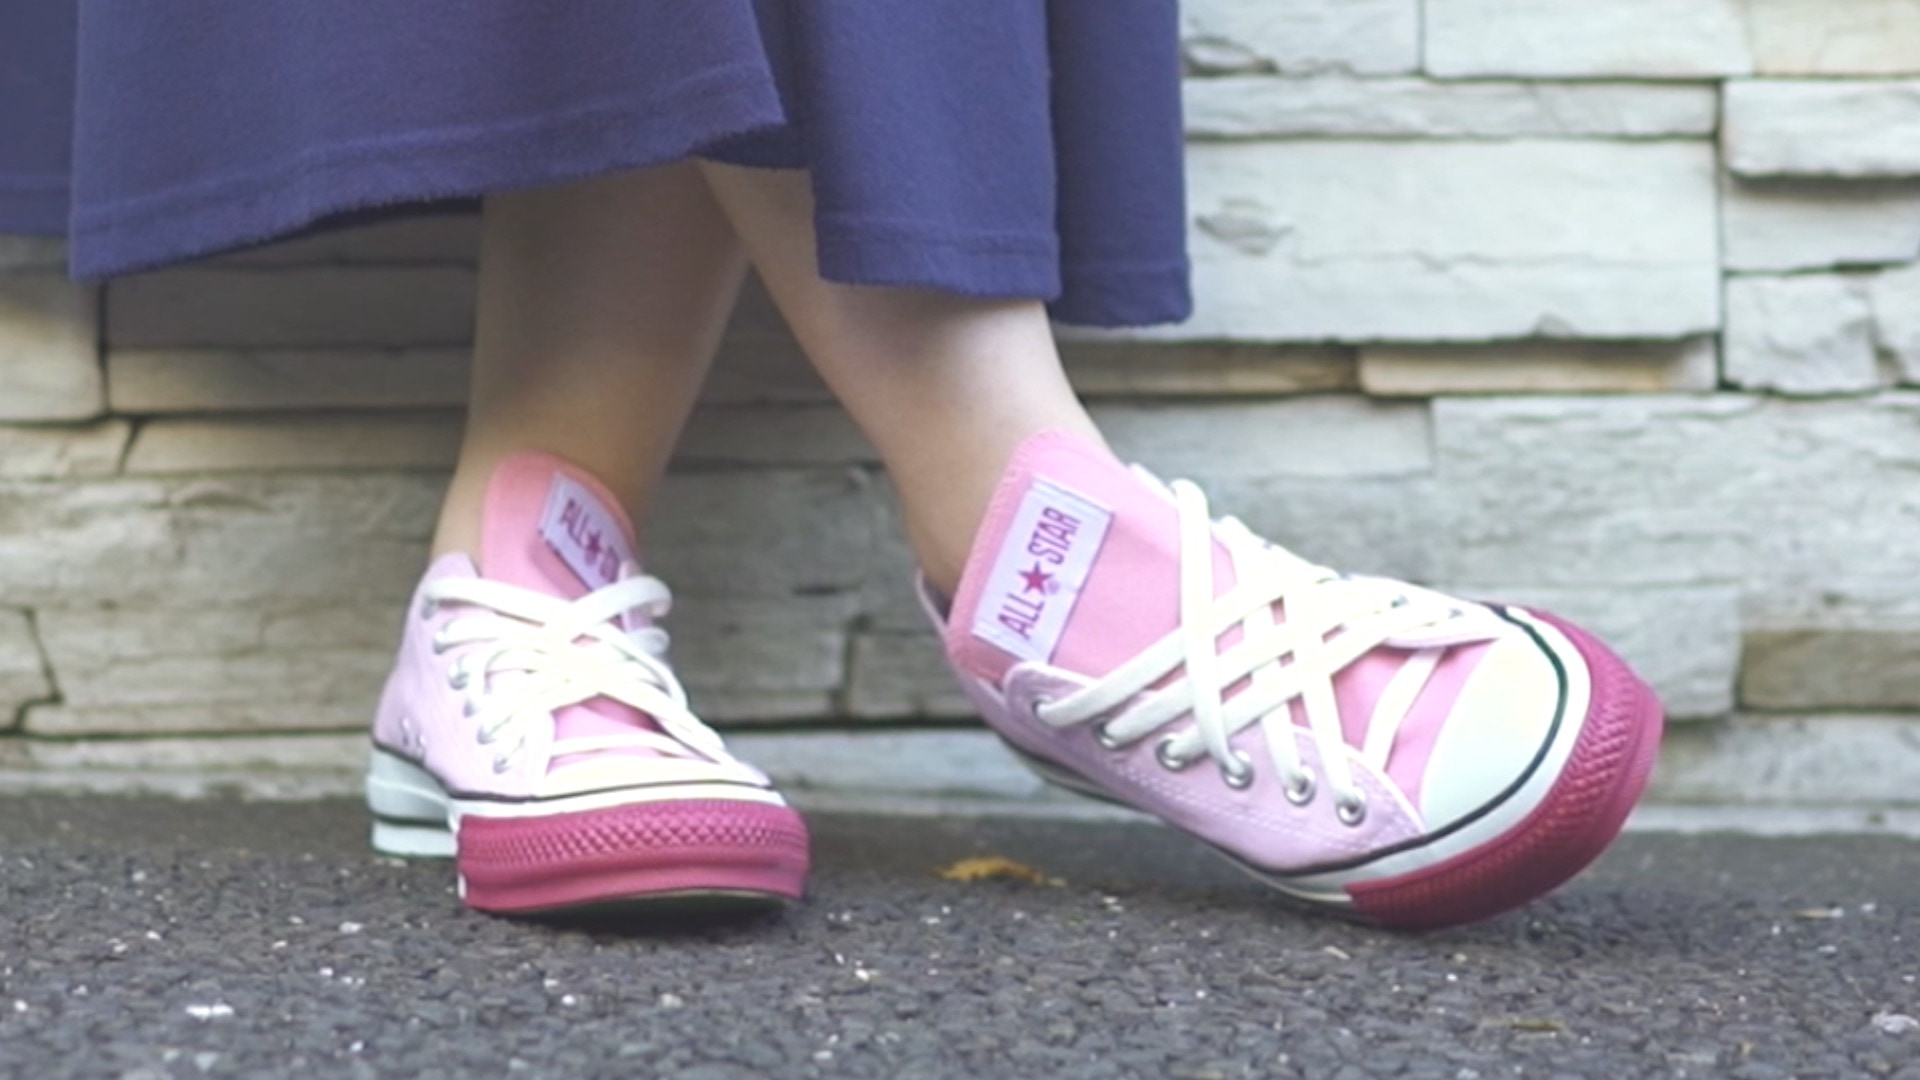 【DIY】CONVERSEの靴紐の結び方アレンジ#4